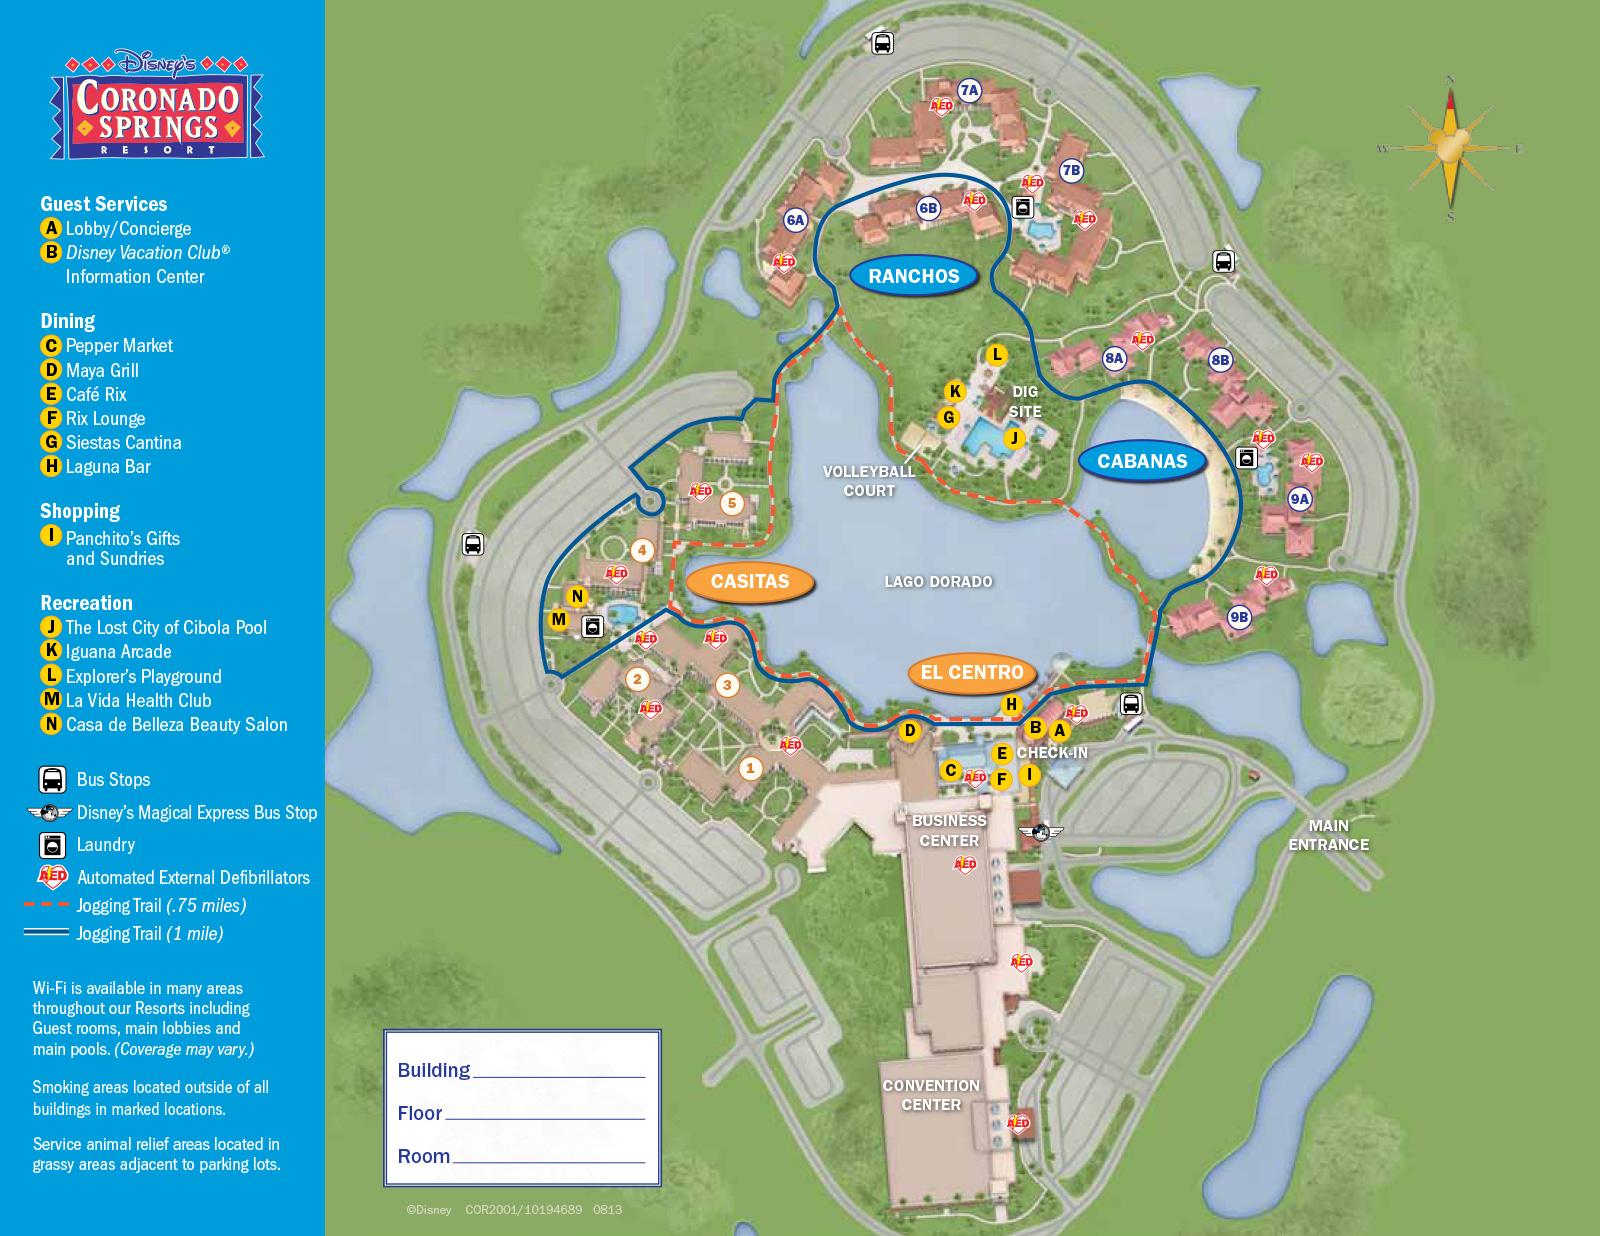 2013 Coronado Springs guide map - Photo 1 of 3